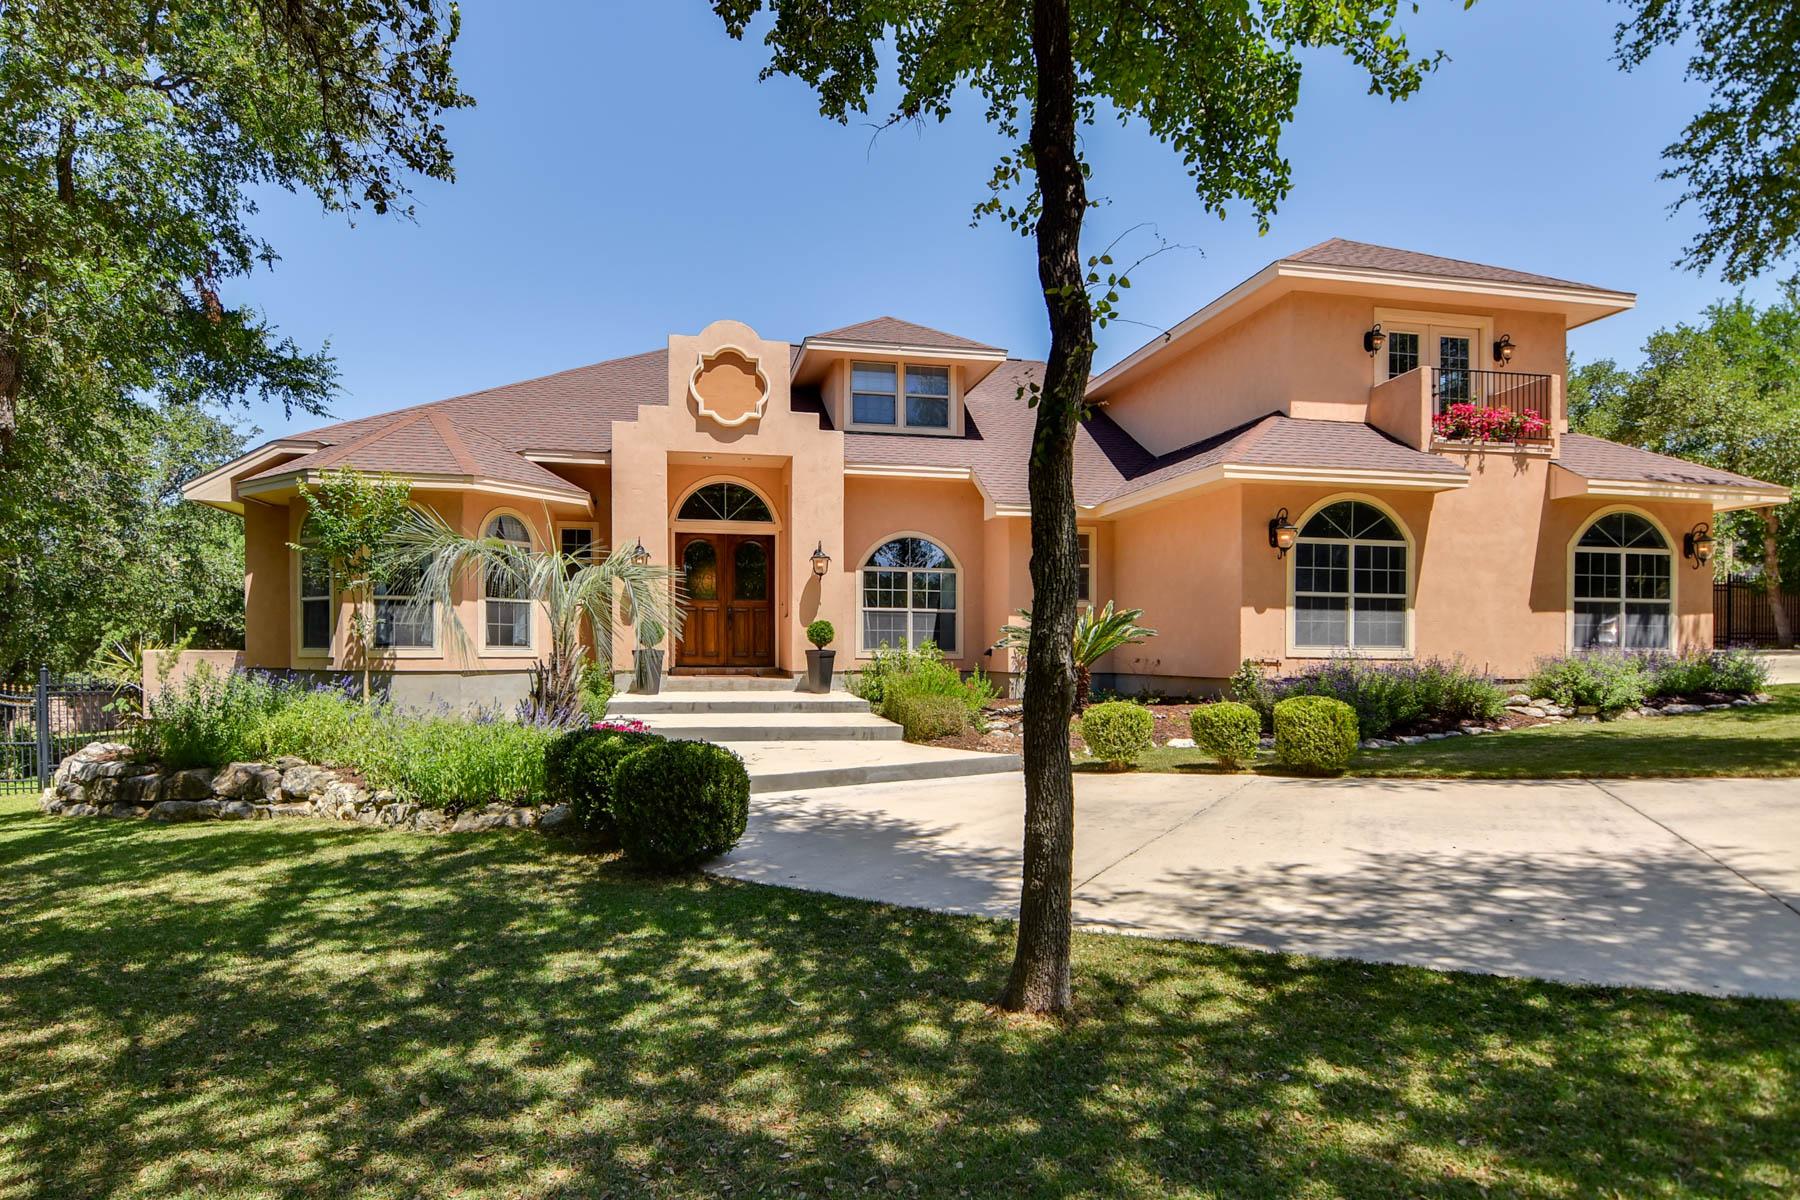 Casa Unifamiliar por un Venta en Tranquil Home in Gated Community in Garden Ridge 19819 Zephyr Cv Garden Ridge, Texas 78266 Estados Unidos